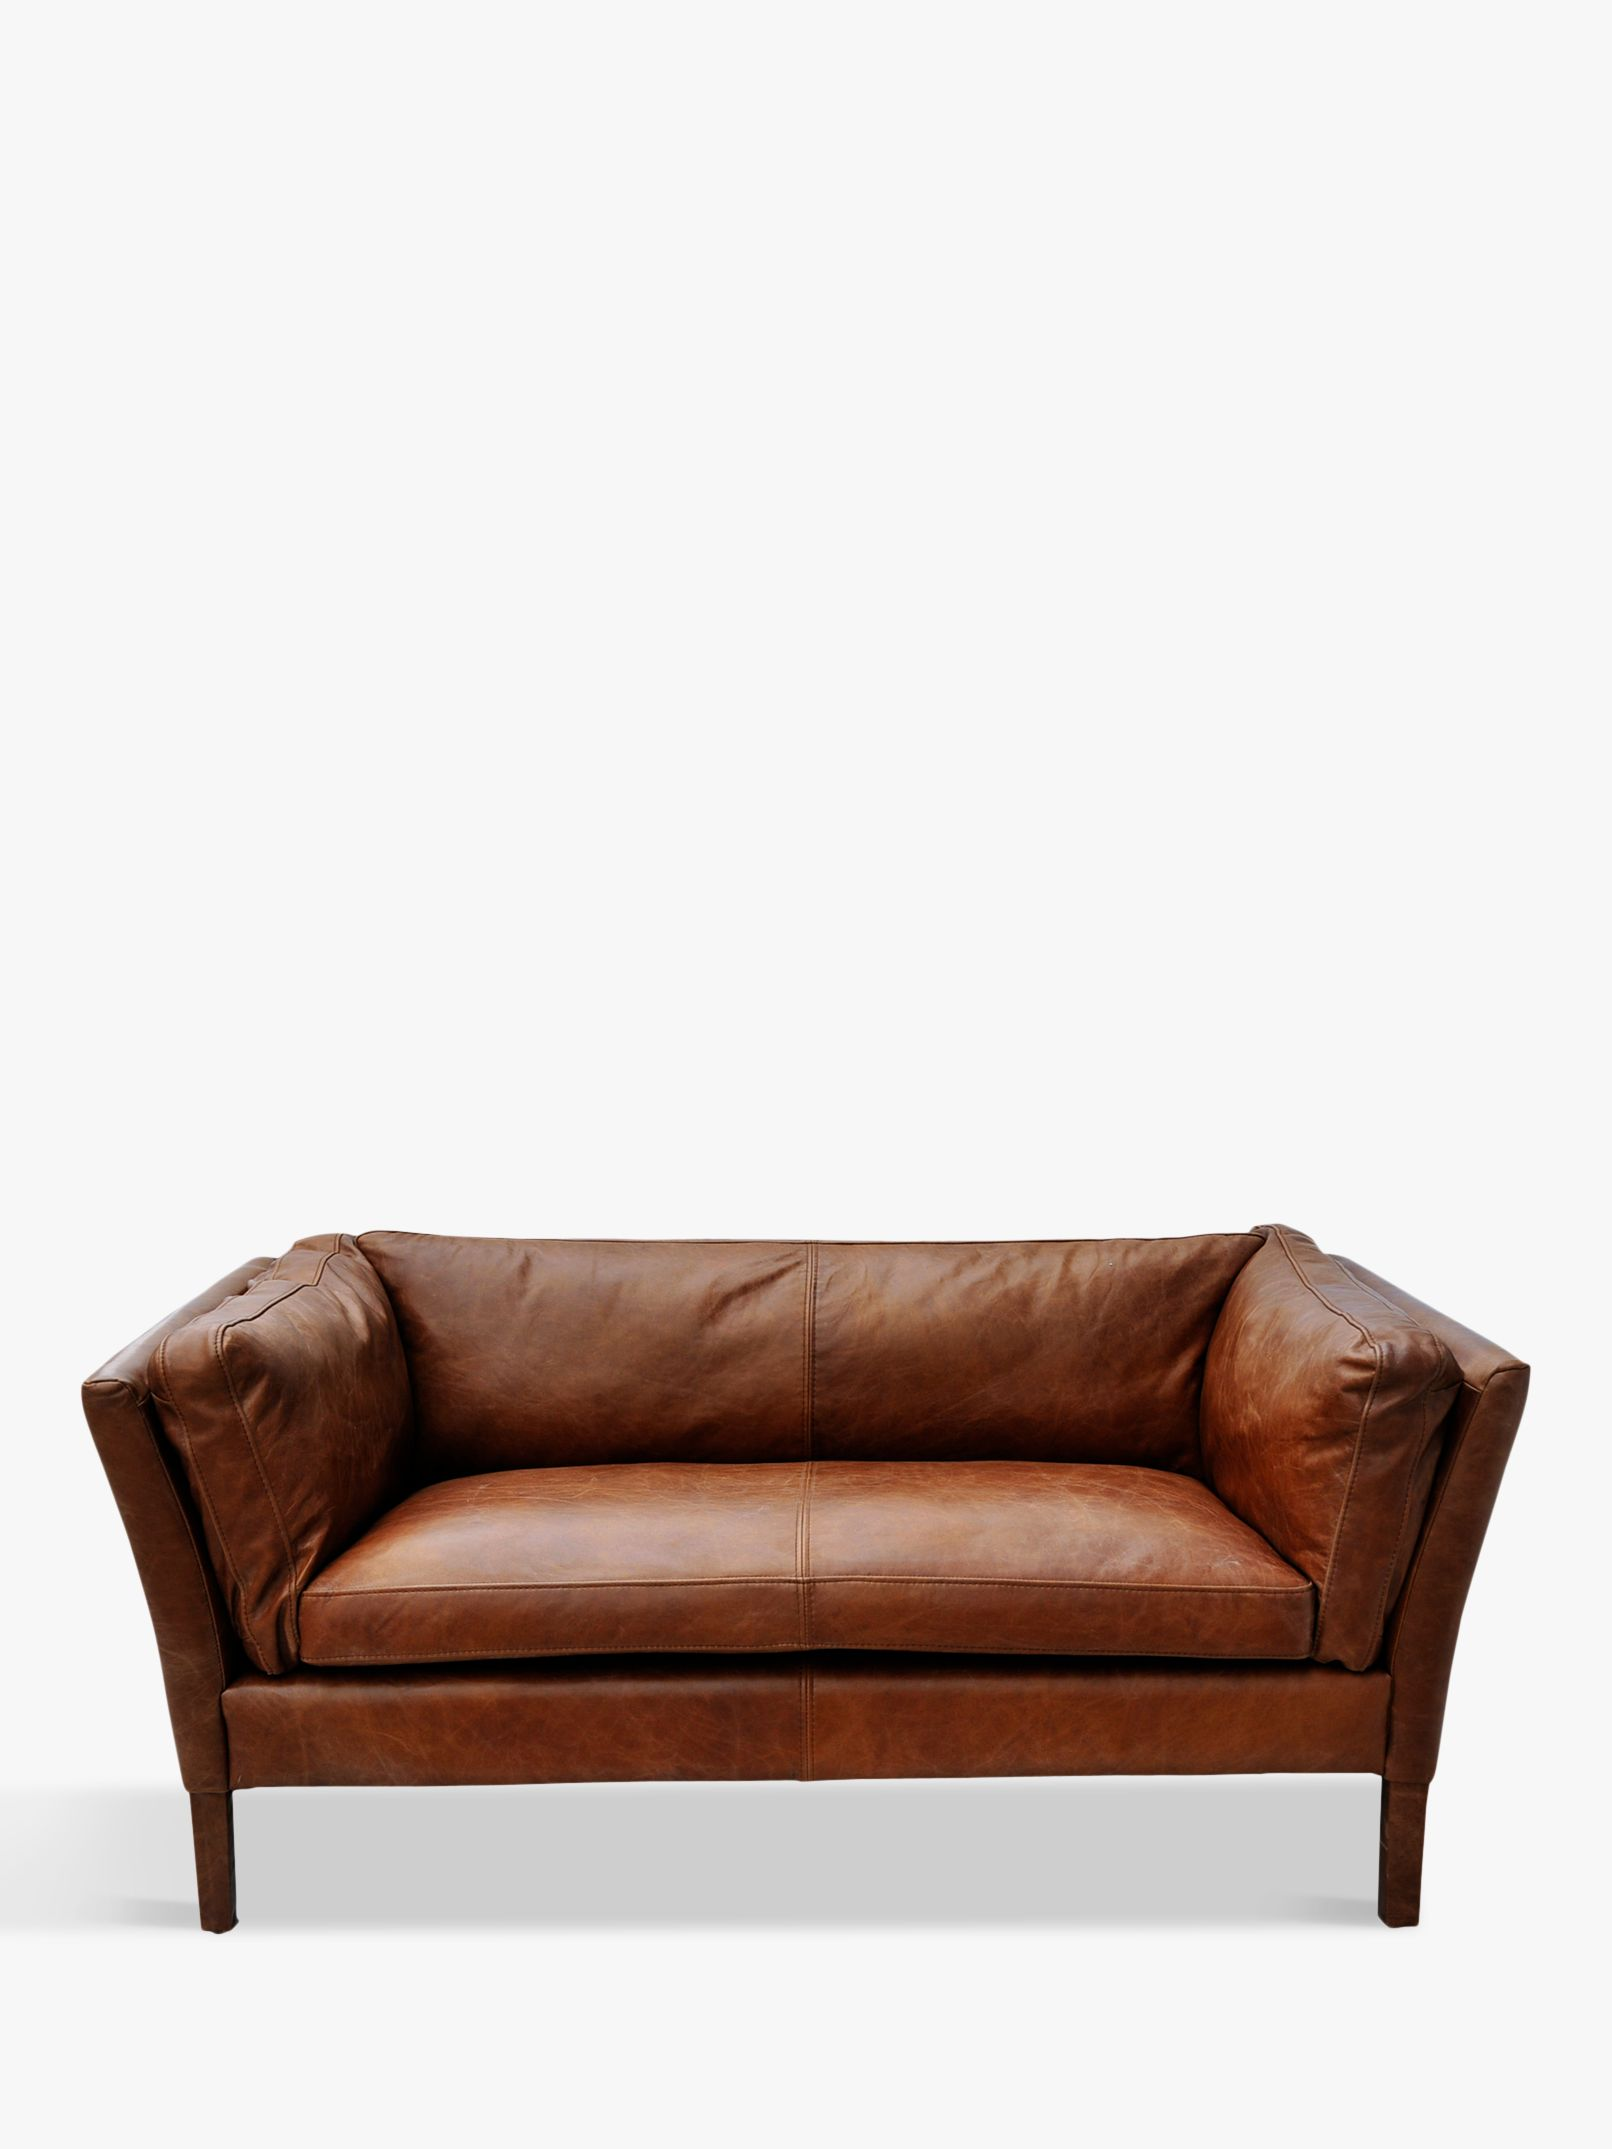 Halo Halo Groucho Small Aniline Leather Sofa